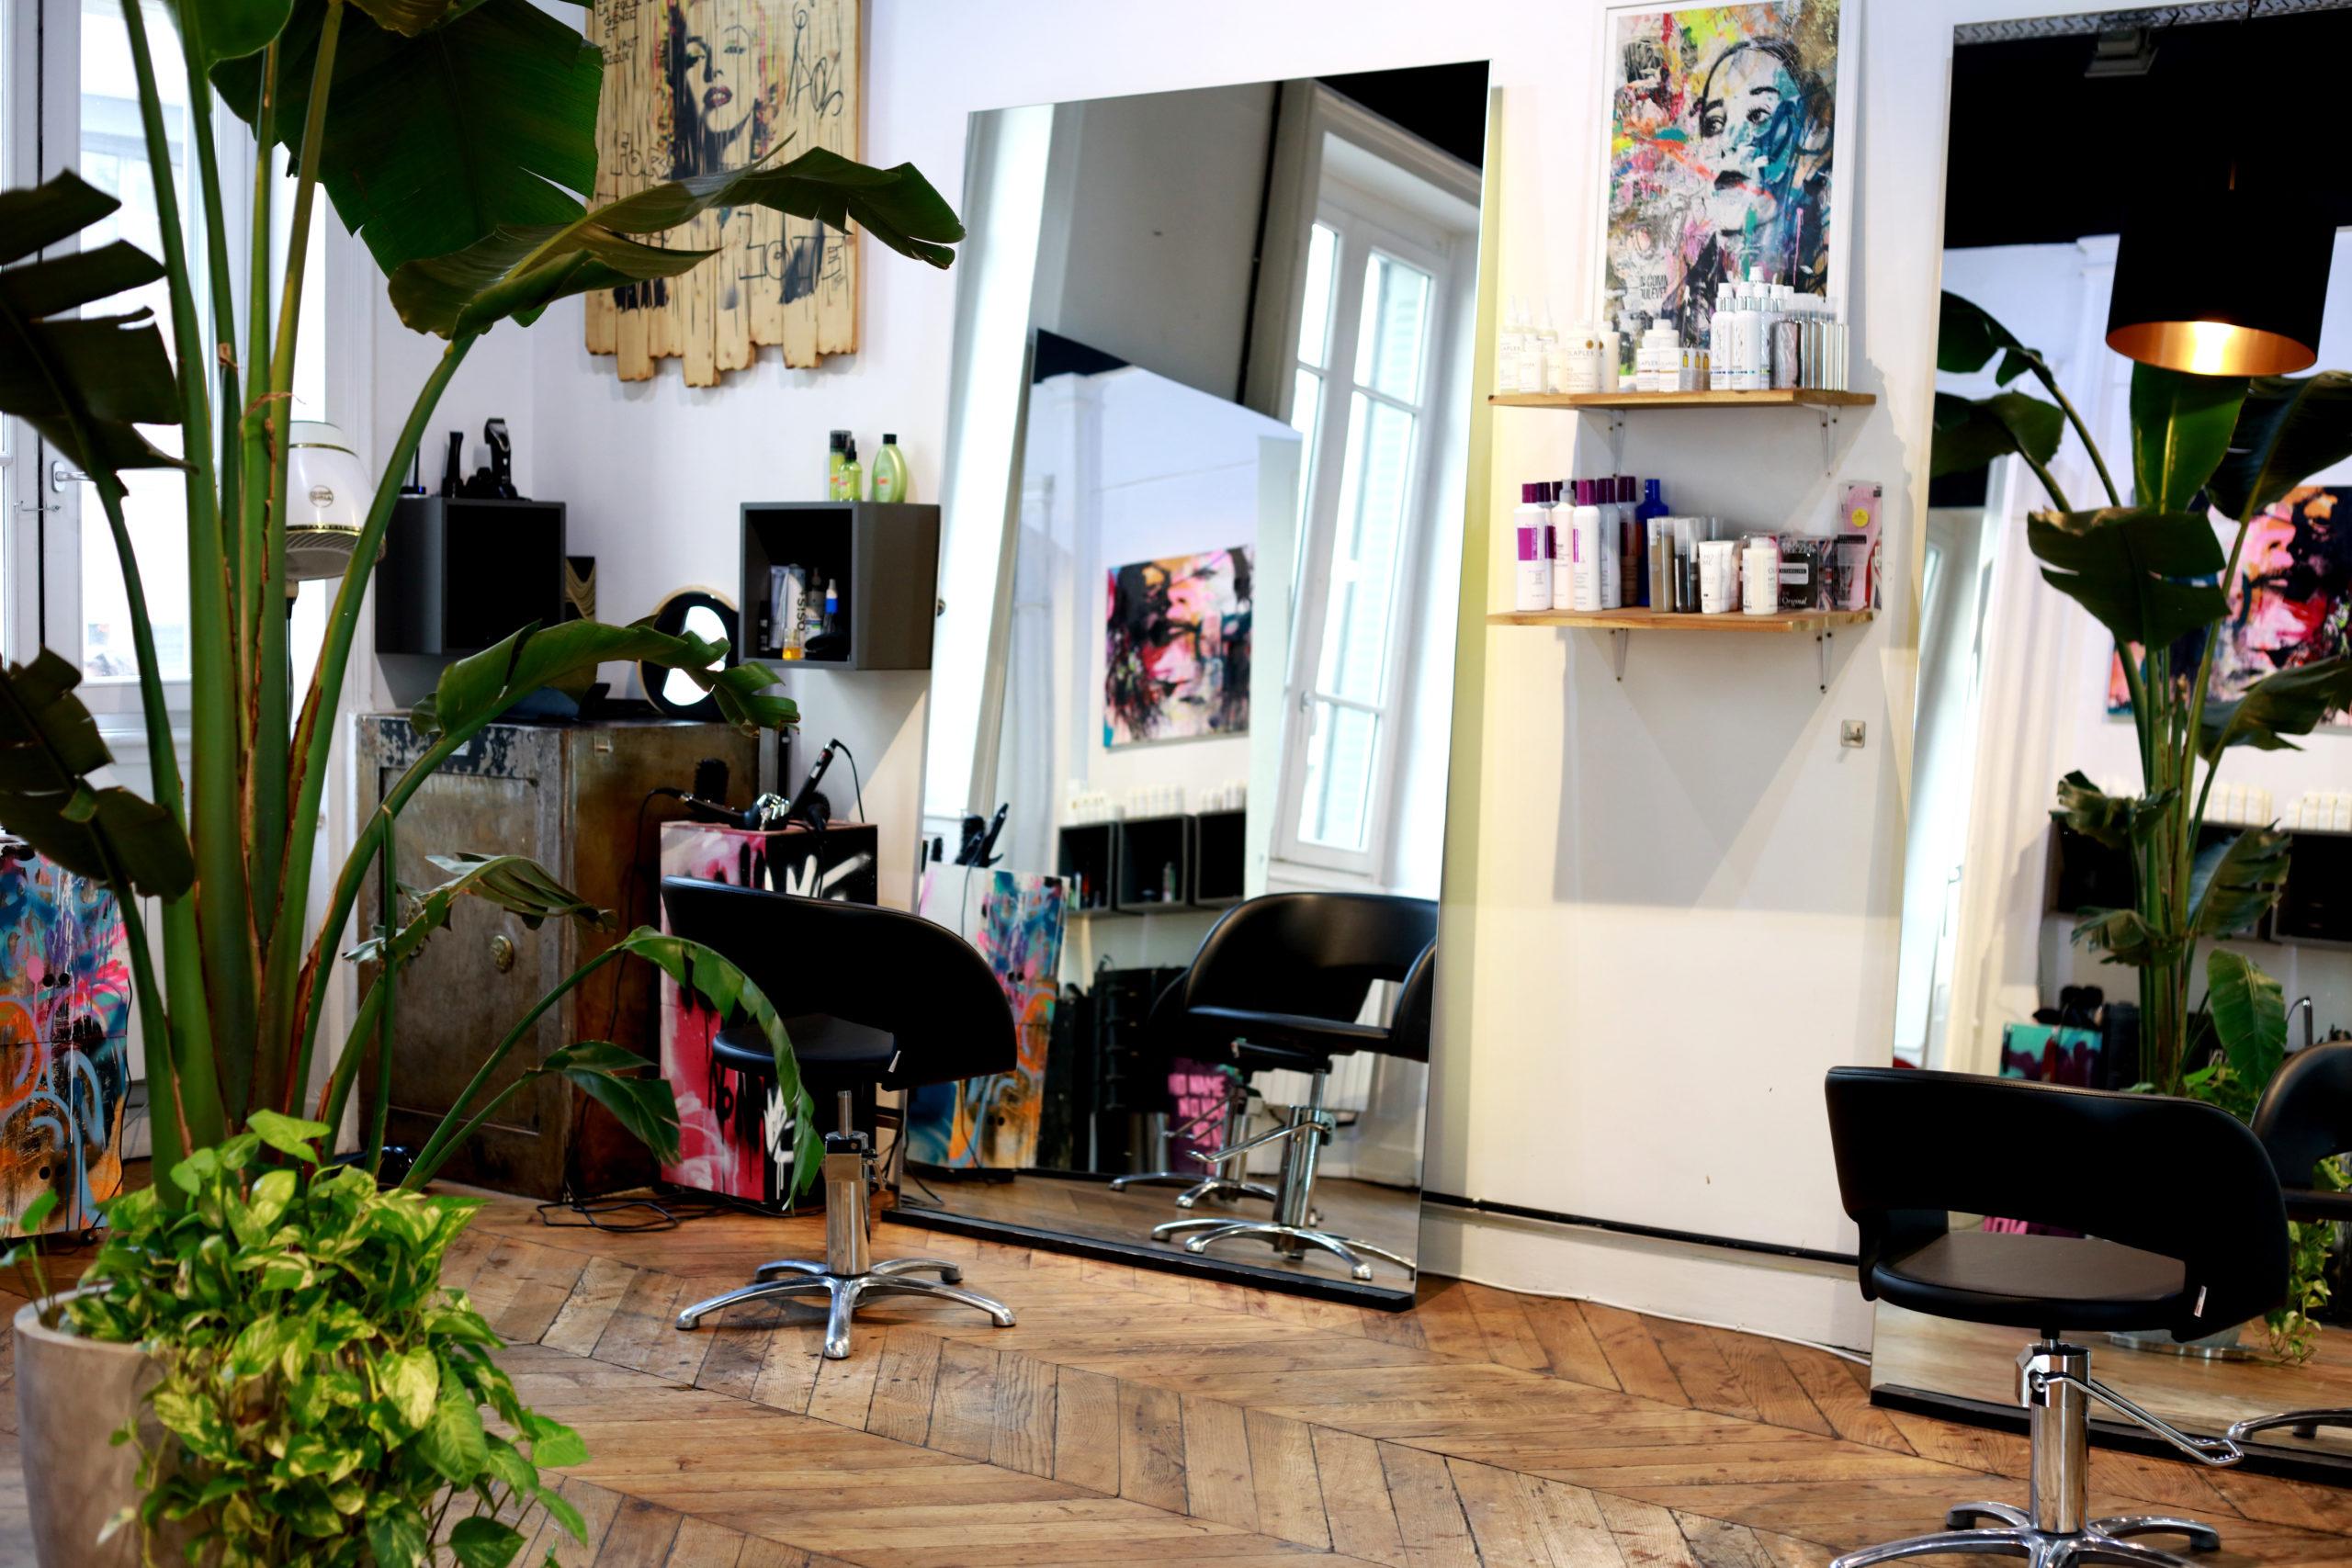 Salon de coiffure en appartement lyon 2